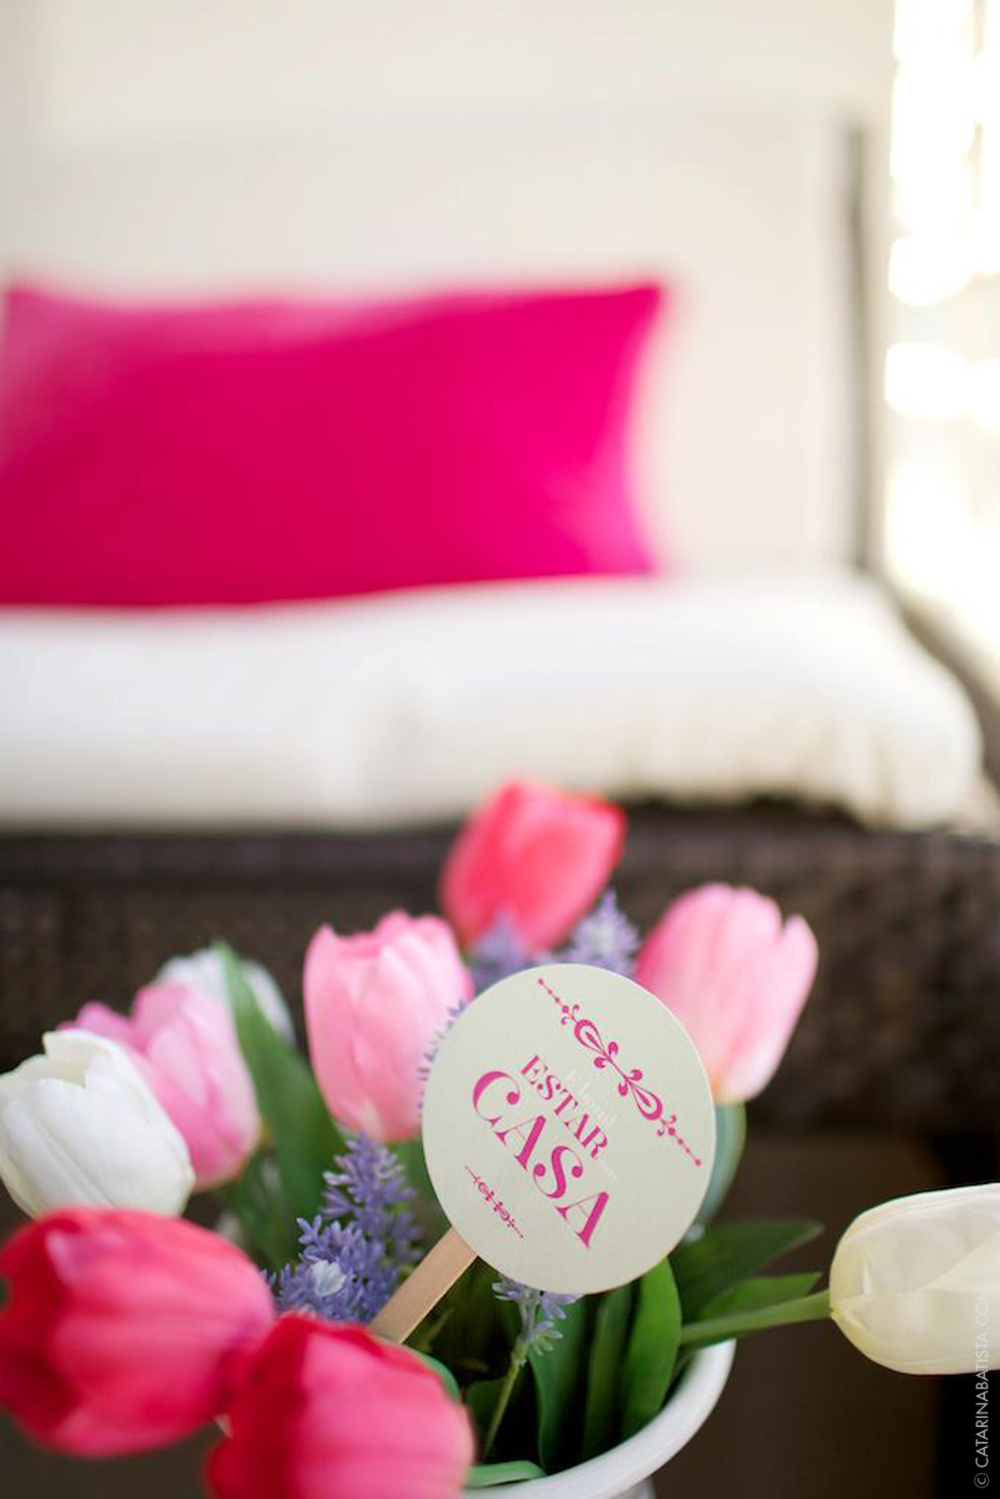 13-catarina-batista-arquitectura-design-interior-apatamento-livingroom-entrecampos-lisboa.jpg